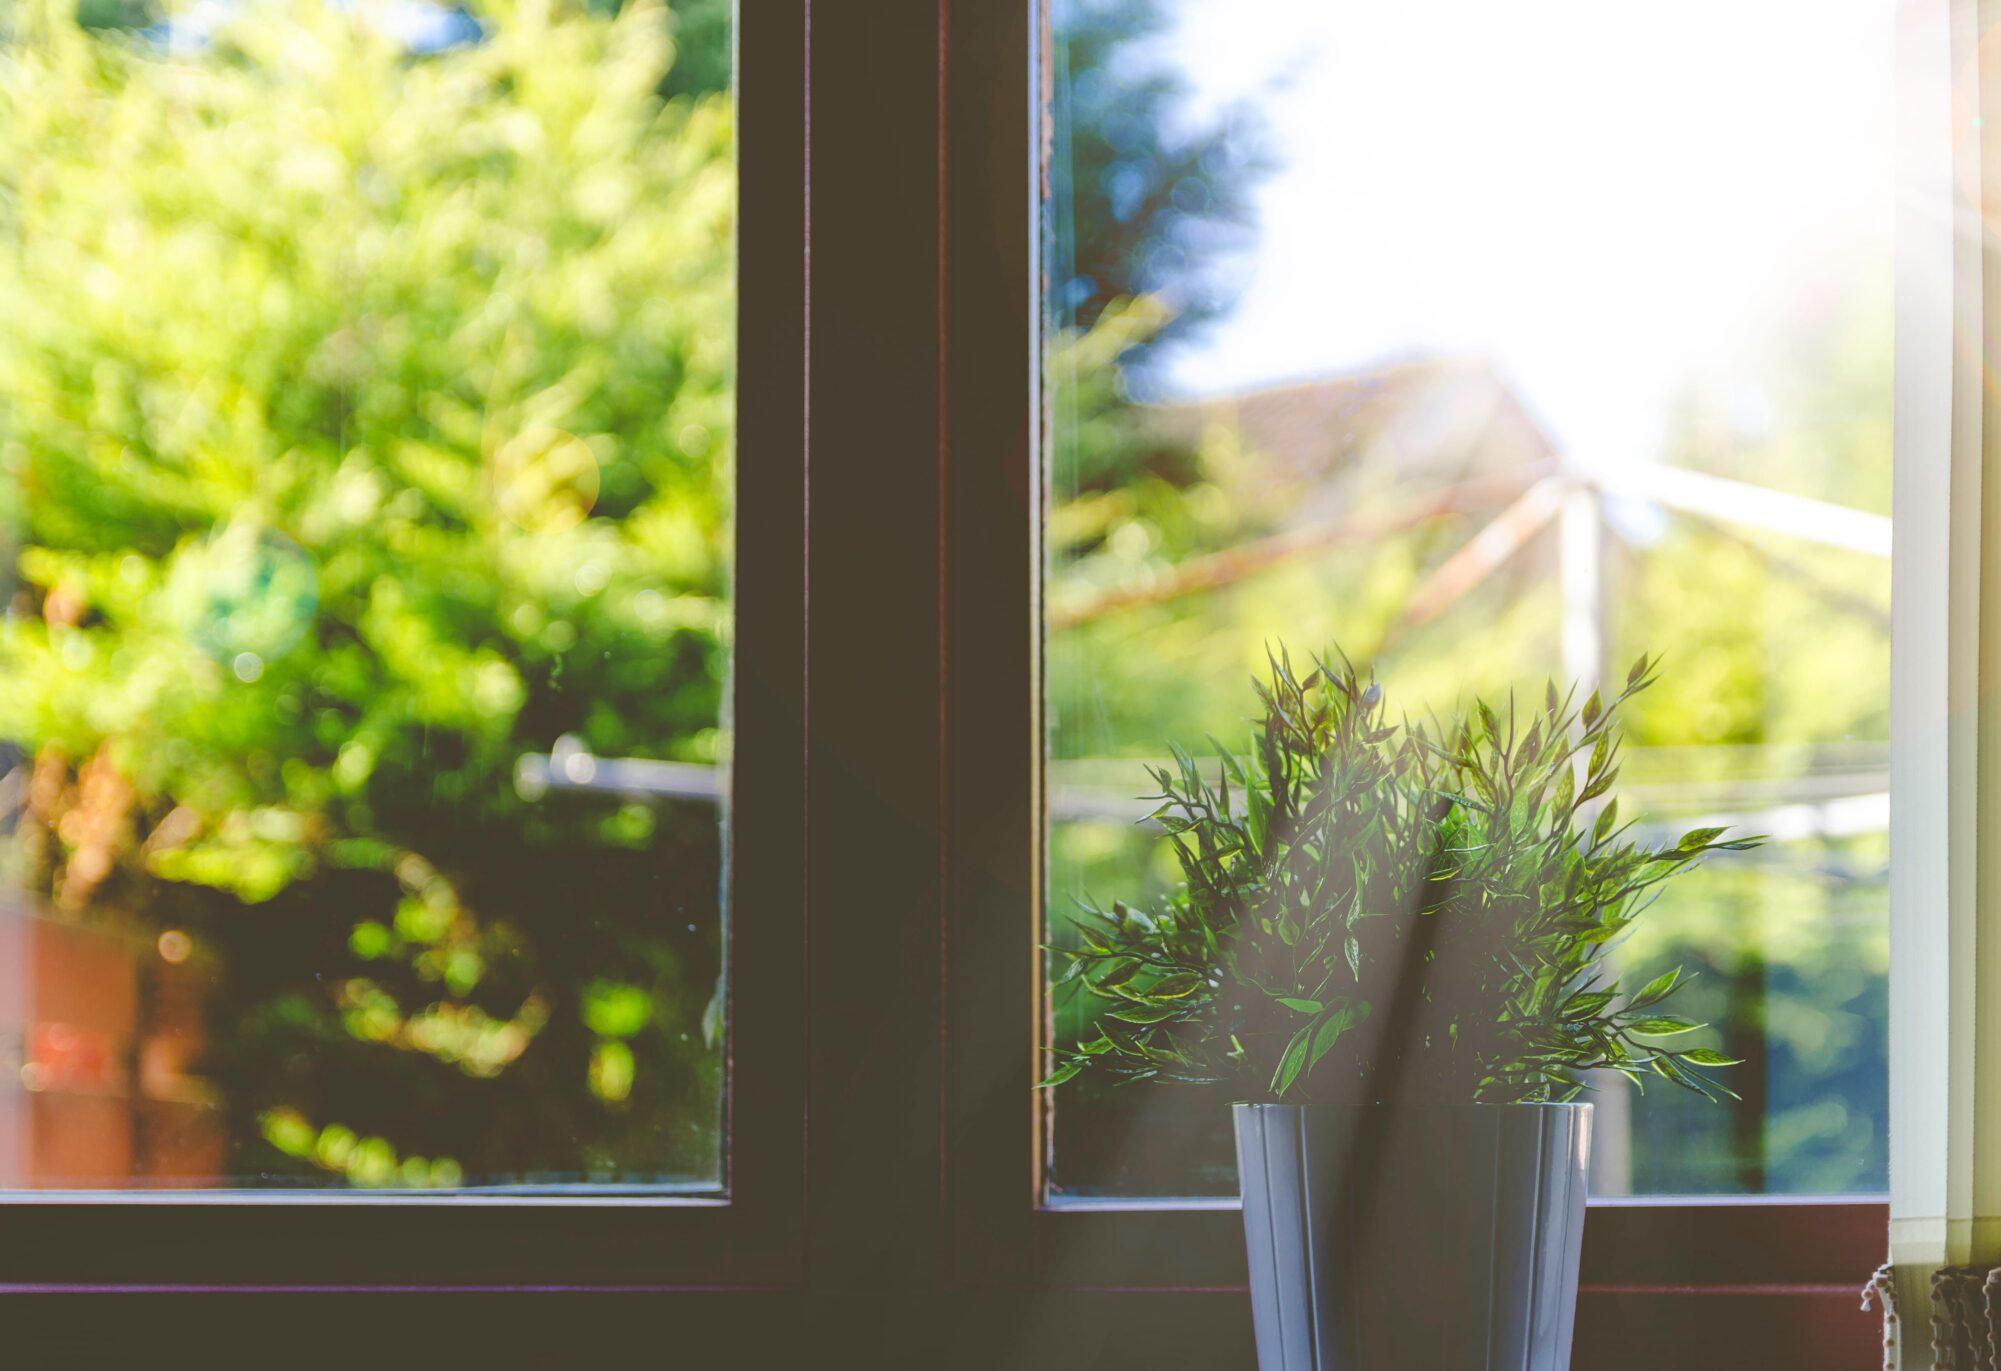 Clean Home Window With Sun Shining Through